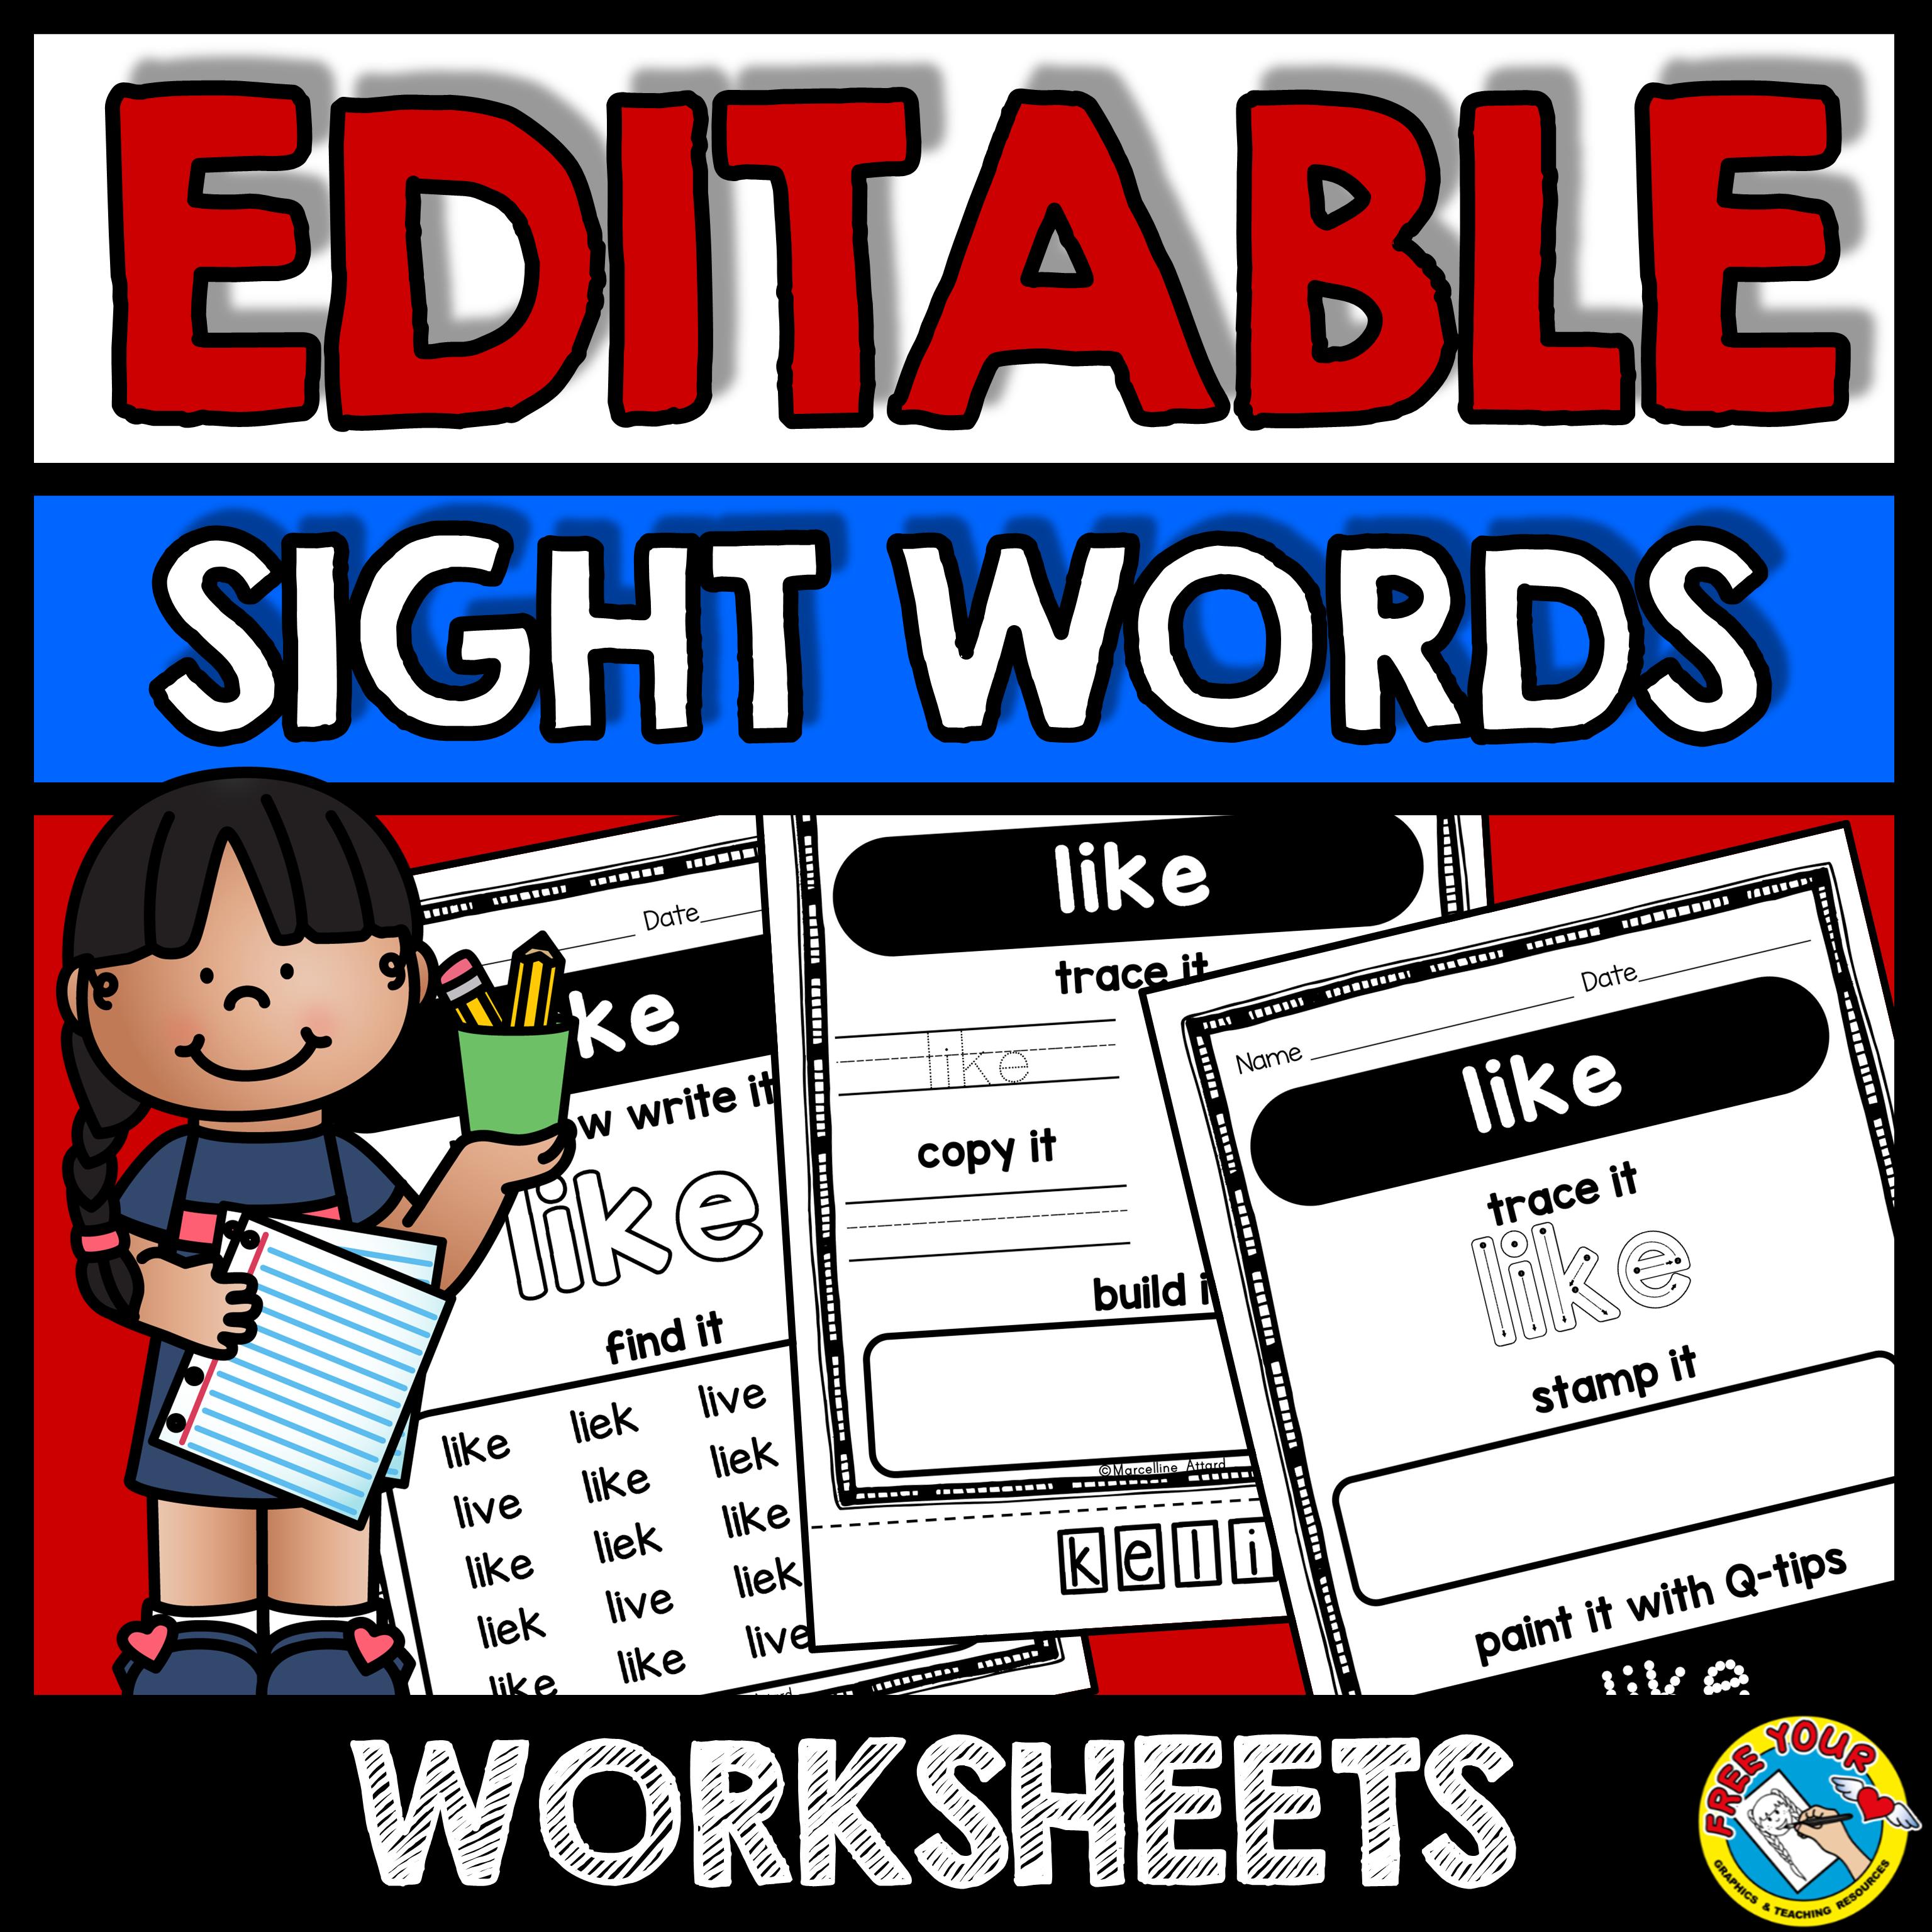 Editable Sight Words Worksheets Editable Sight Words